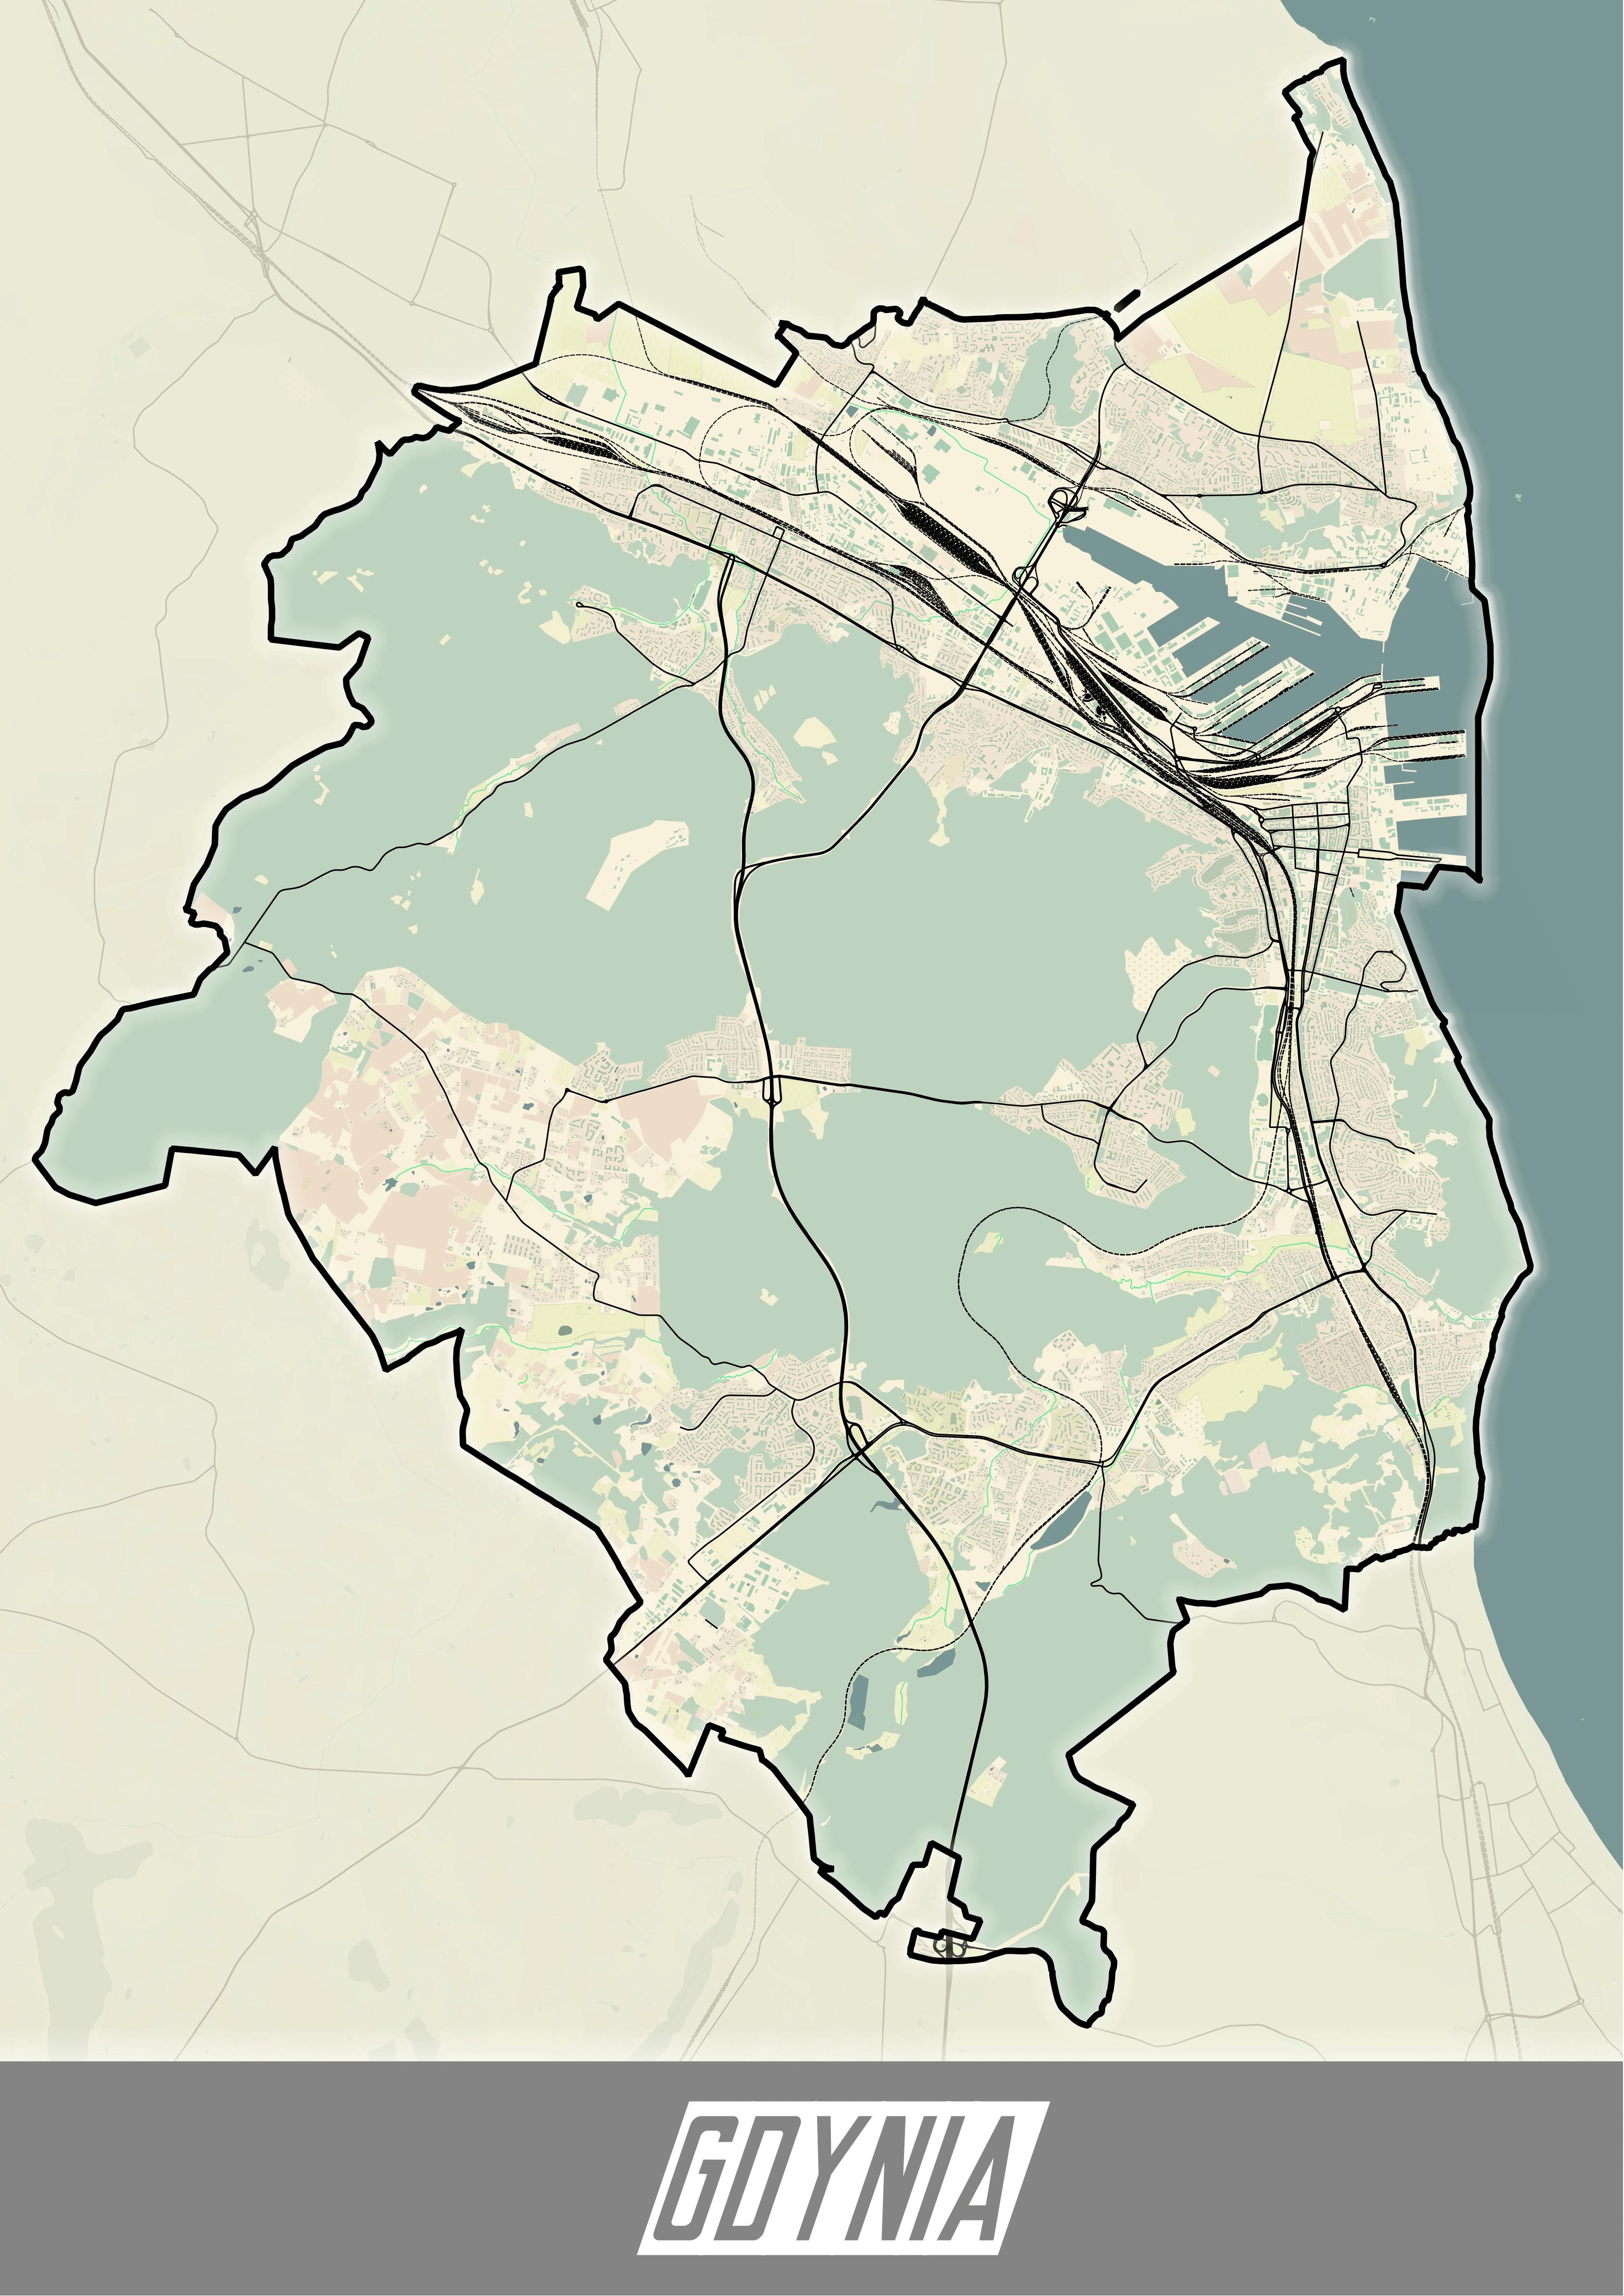 Gdynia A2 retro-1-min